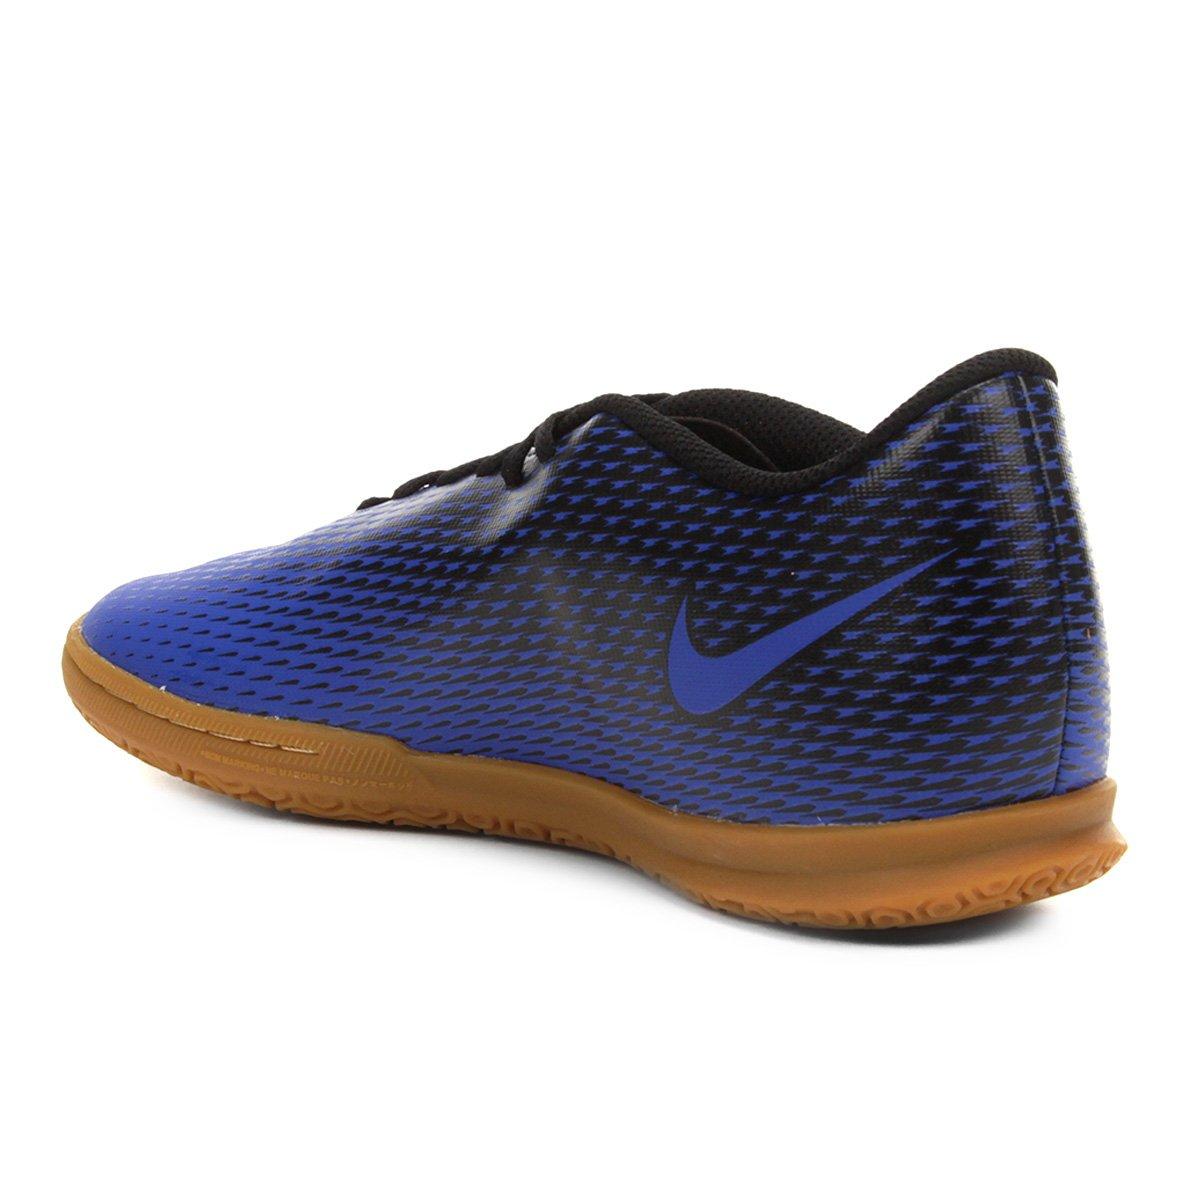 8d22d91879cbc Chuteira Futsal Nike Bravata 2 IC - Shopping TudoAzul